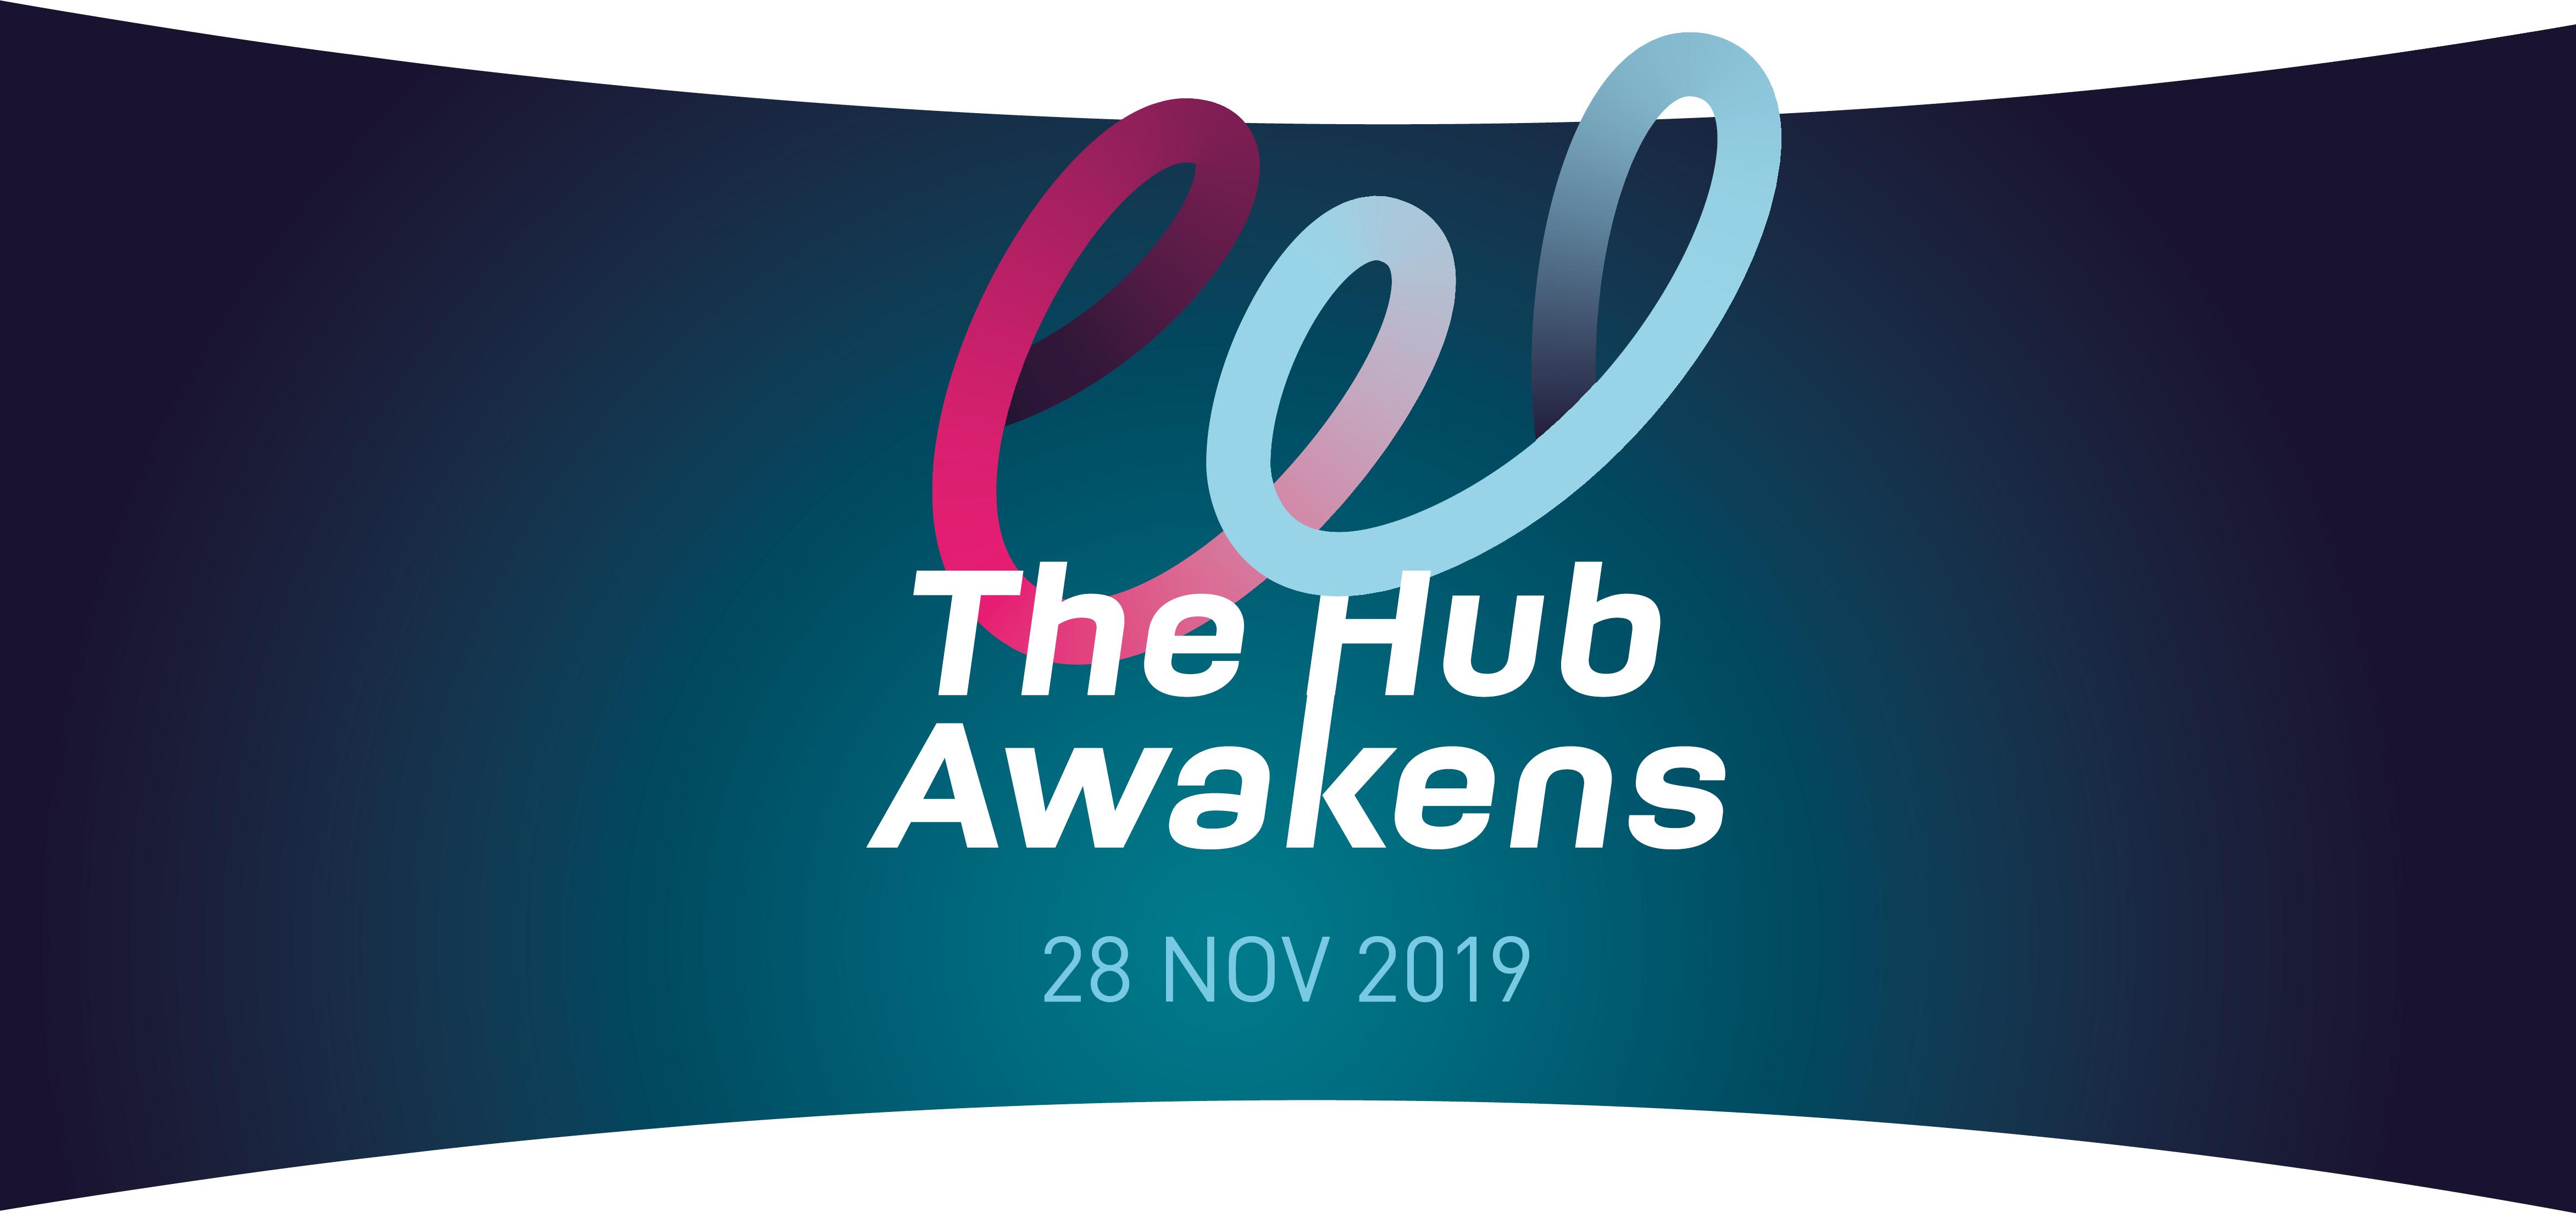 The Hub Awakens - mobile